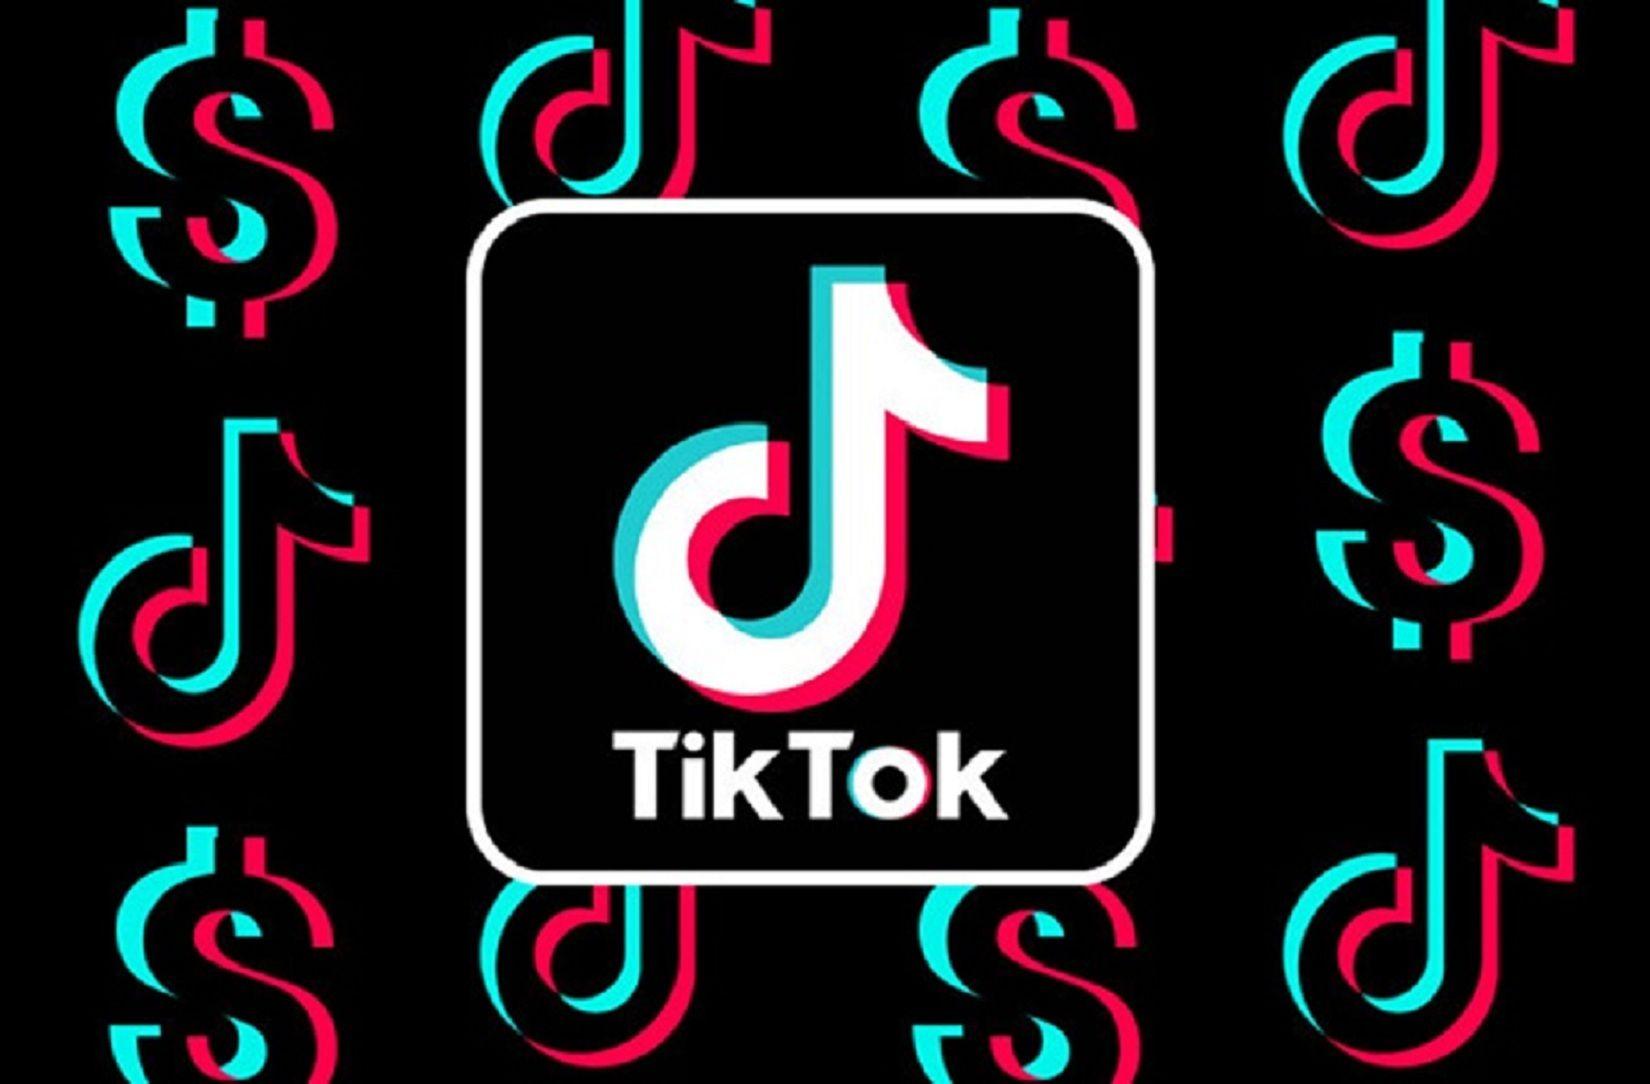 Tik Tok Google Sok Social Media Apps How To Get Followers Free Followers